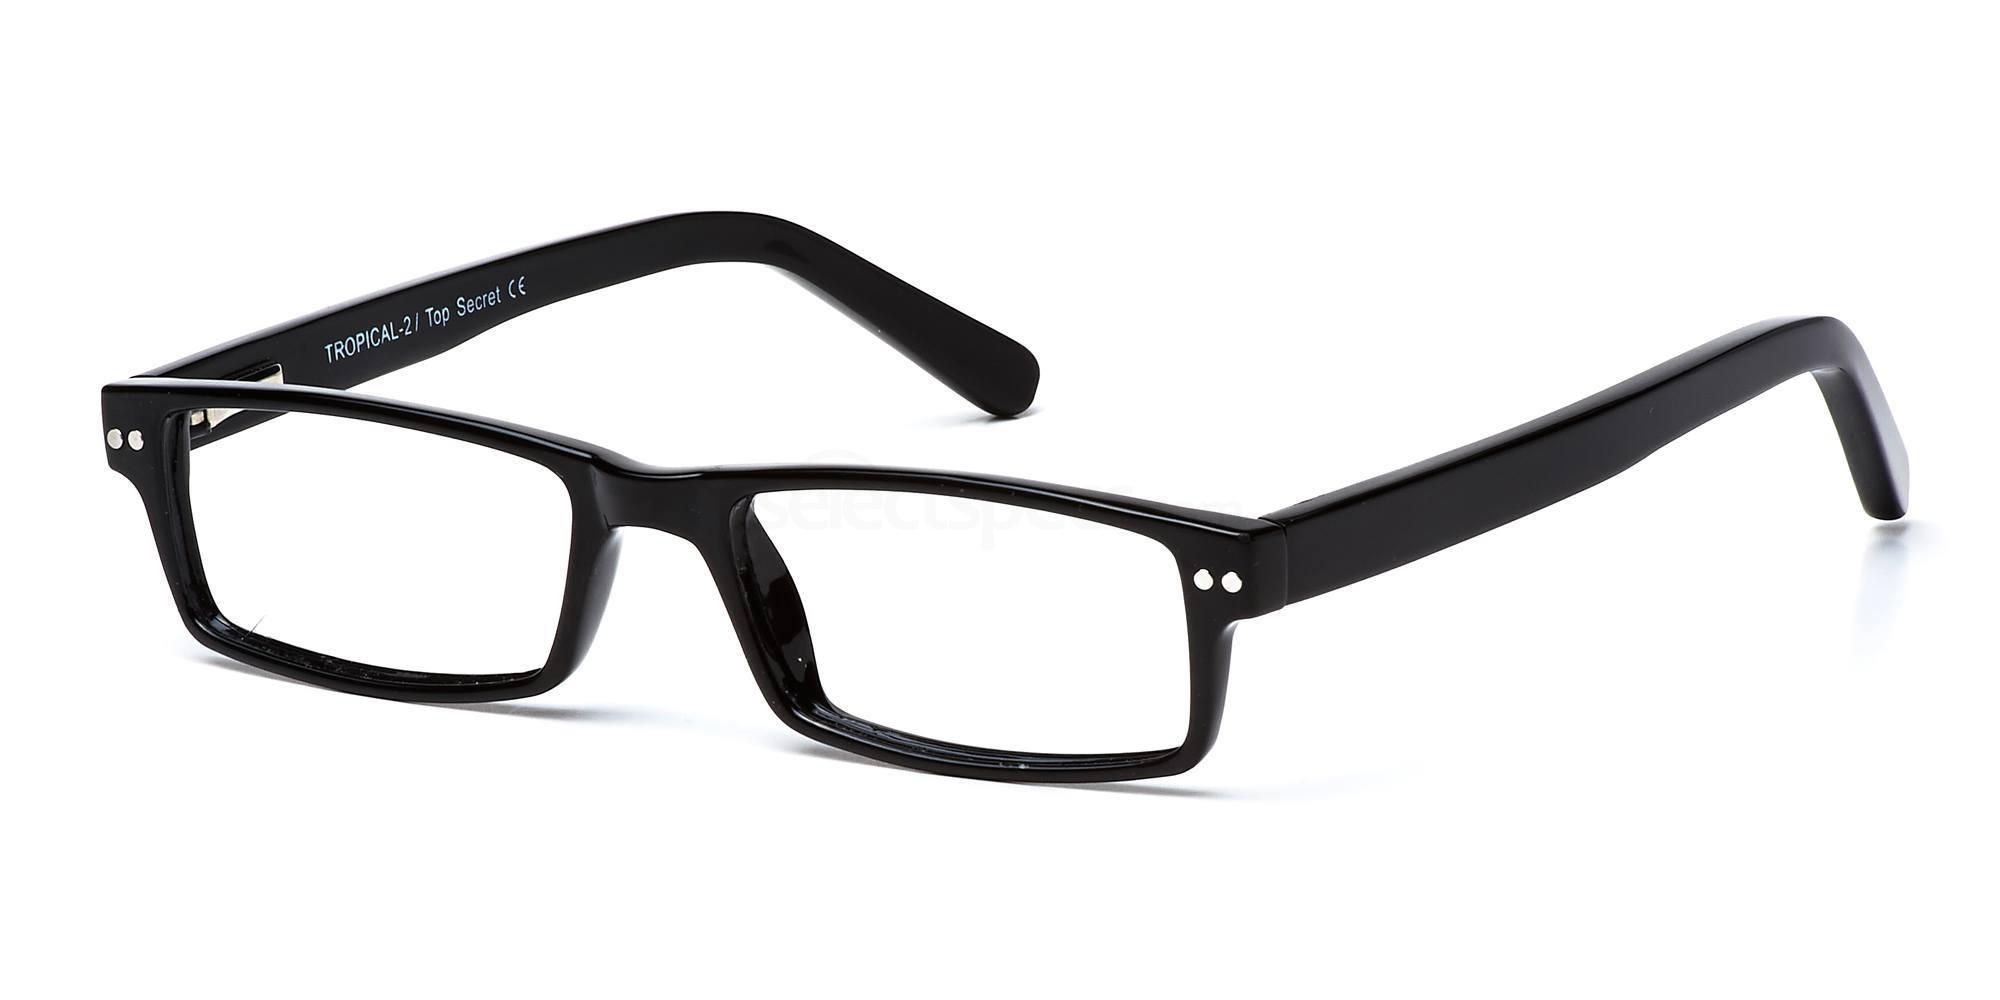 C1 TROPICAL2 Glasses, Top Secret KIDS